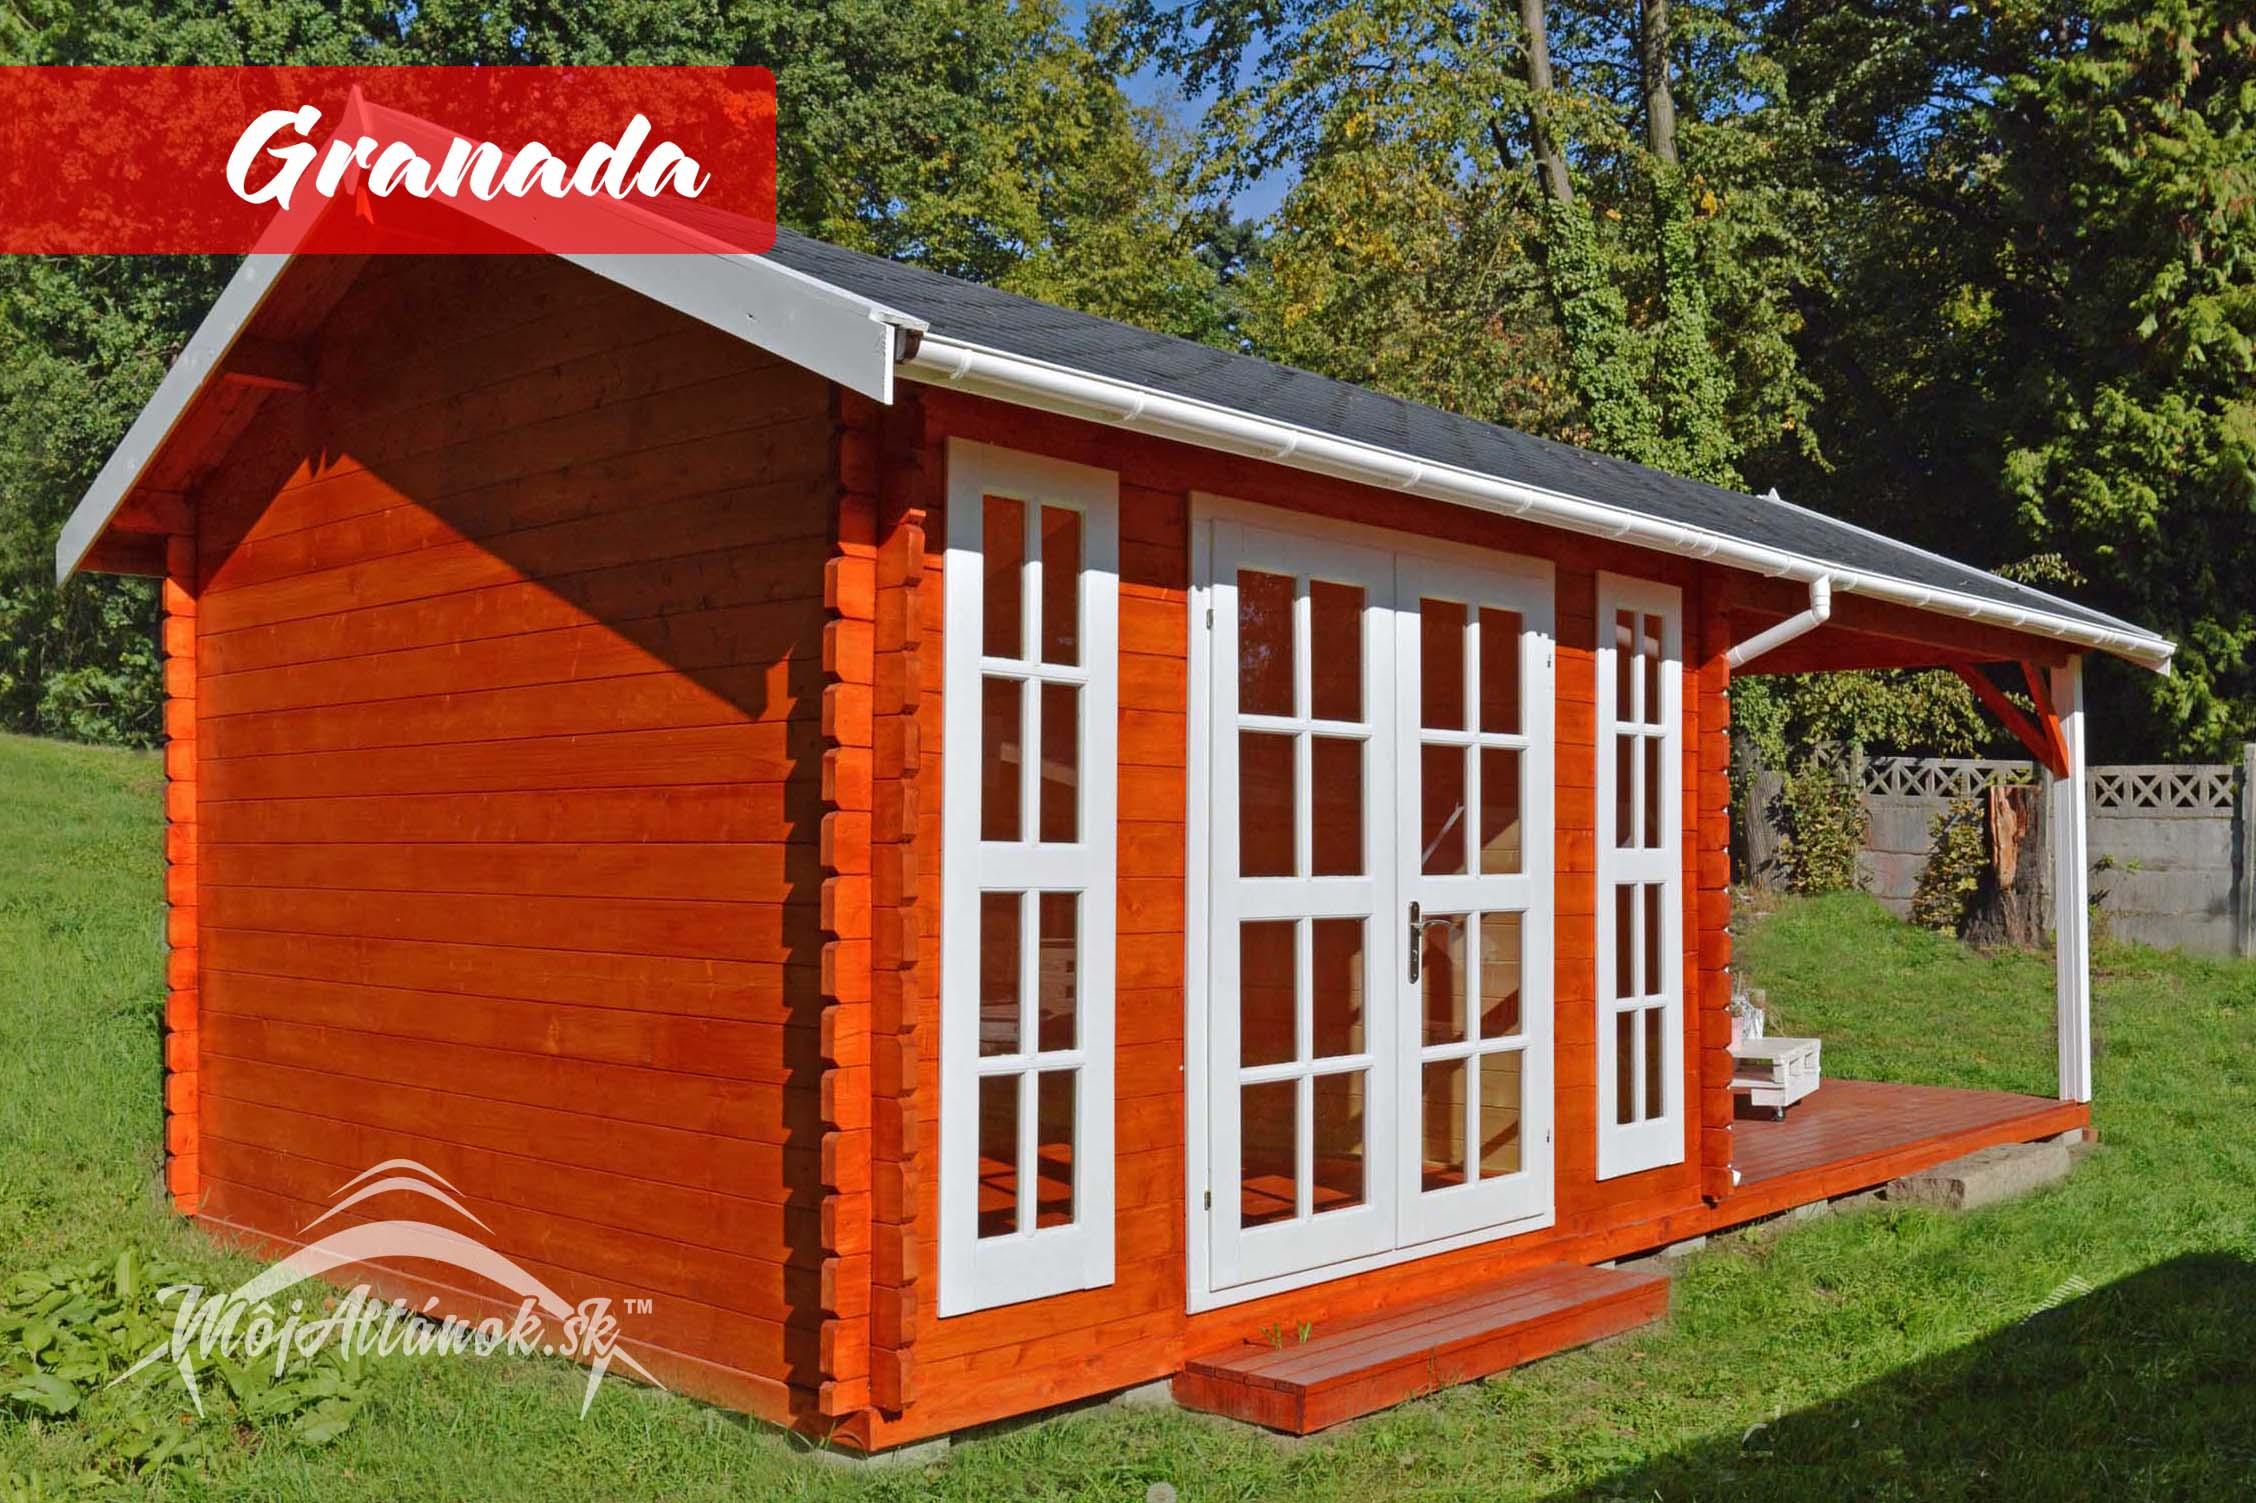 Zahradny domcek GRANADA 1b